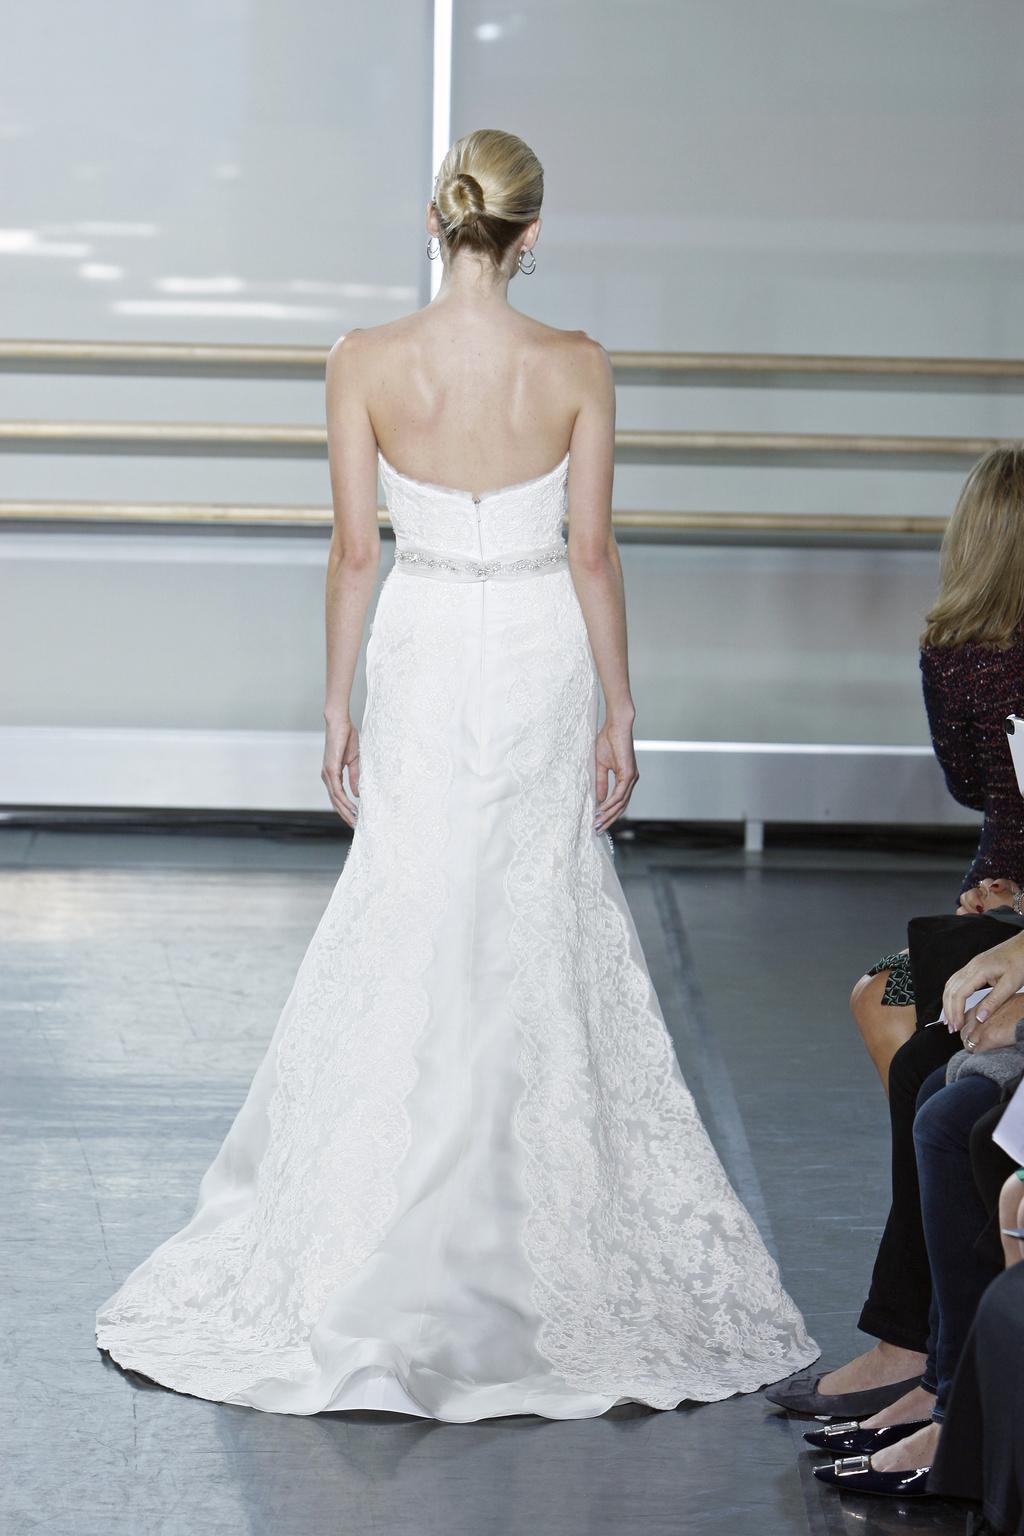 Rivini-wedding-dress-fall-2013-bridal-gown-listra-back.full